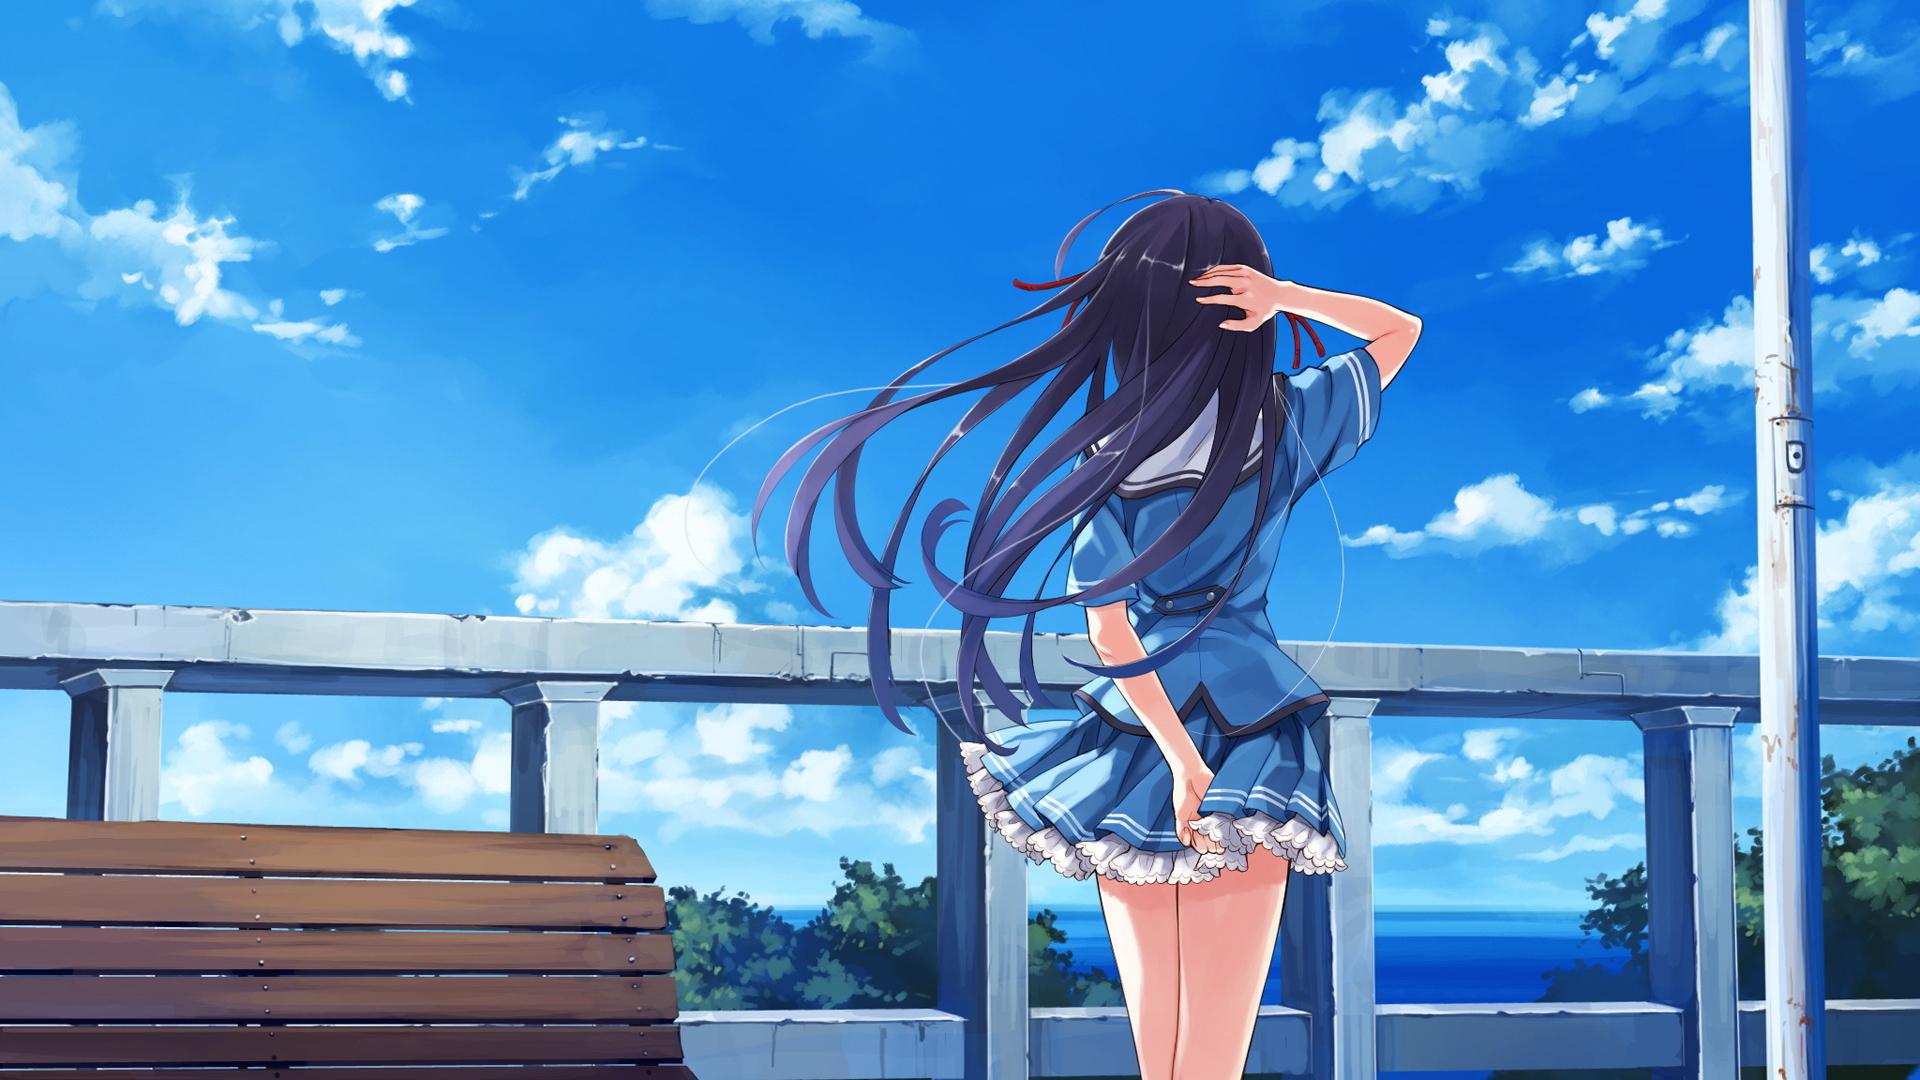 Anime Background HD 5987 1920 x 1080 - WallpaperLayer com